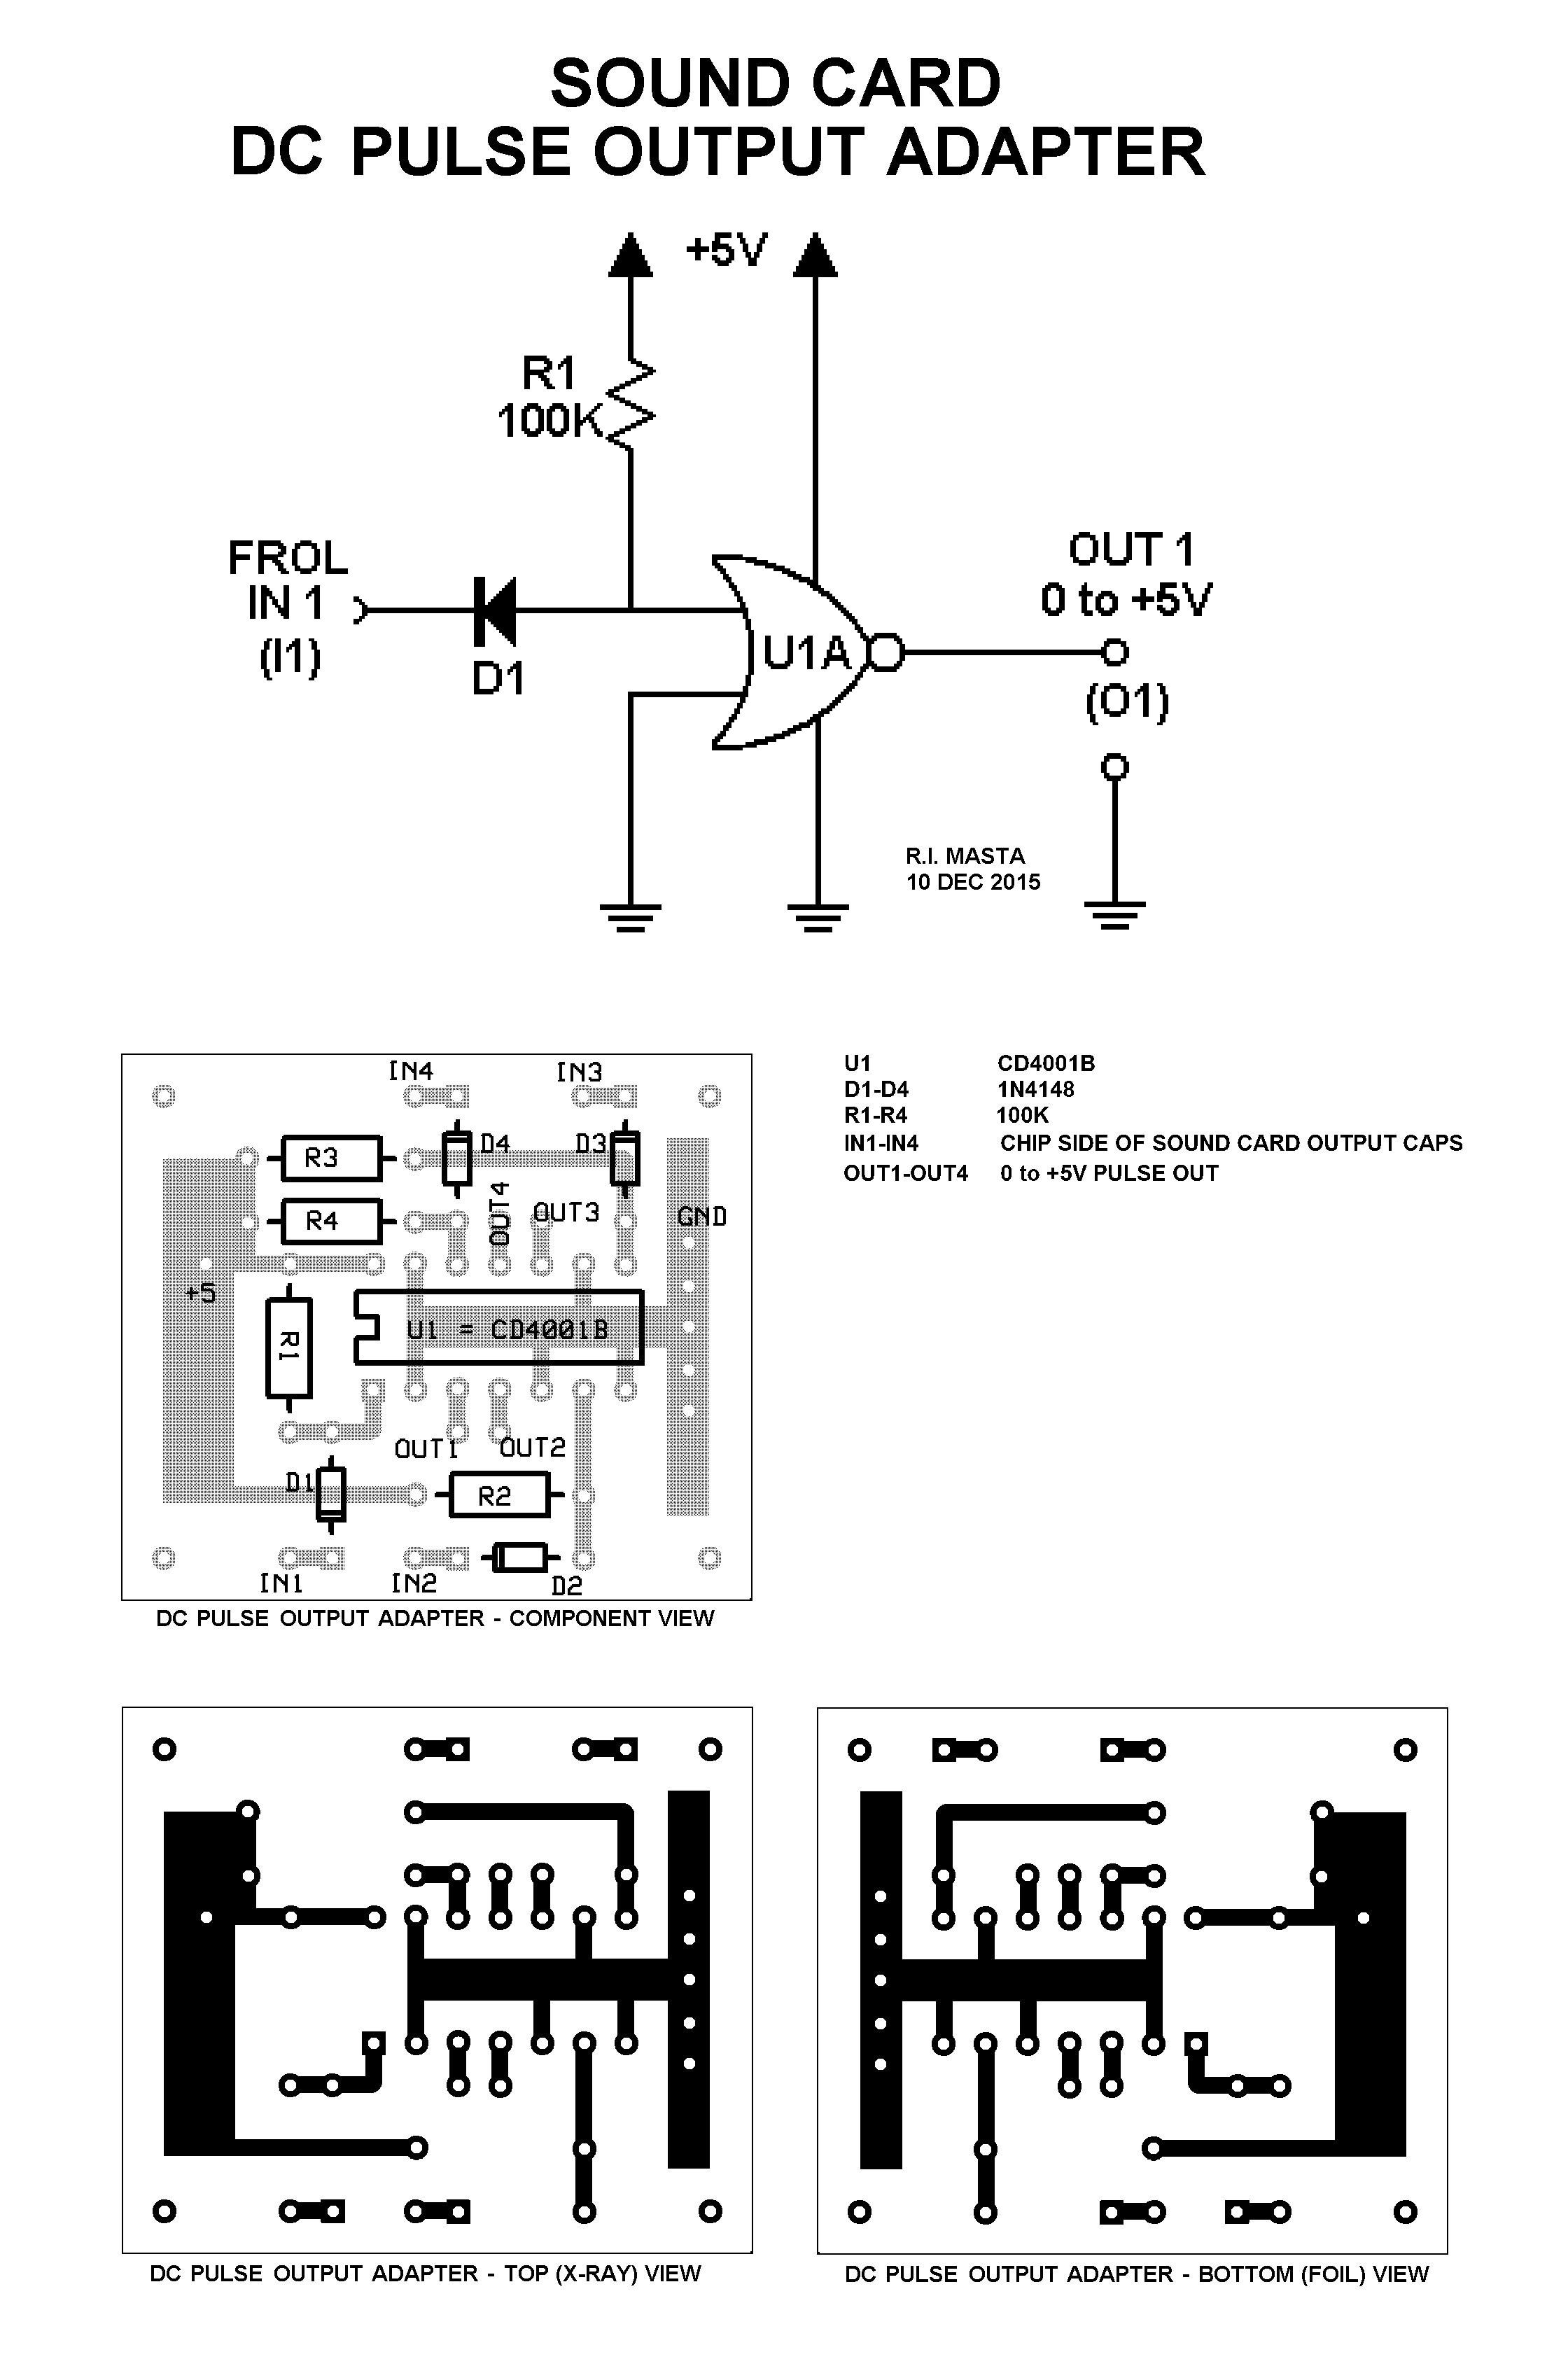 Daqarta Sound Card DC Pulse Output Circuits crystals free full text sortech ls od 6 x ray